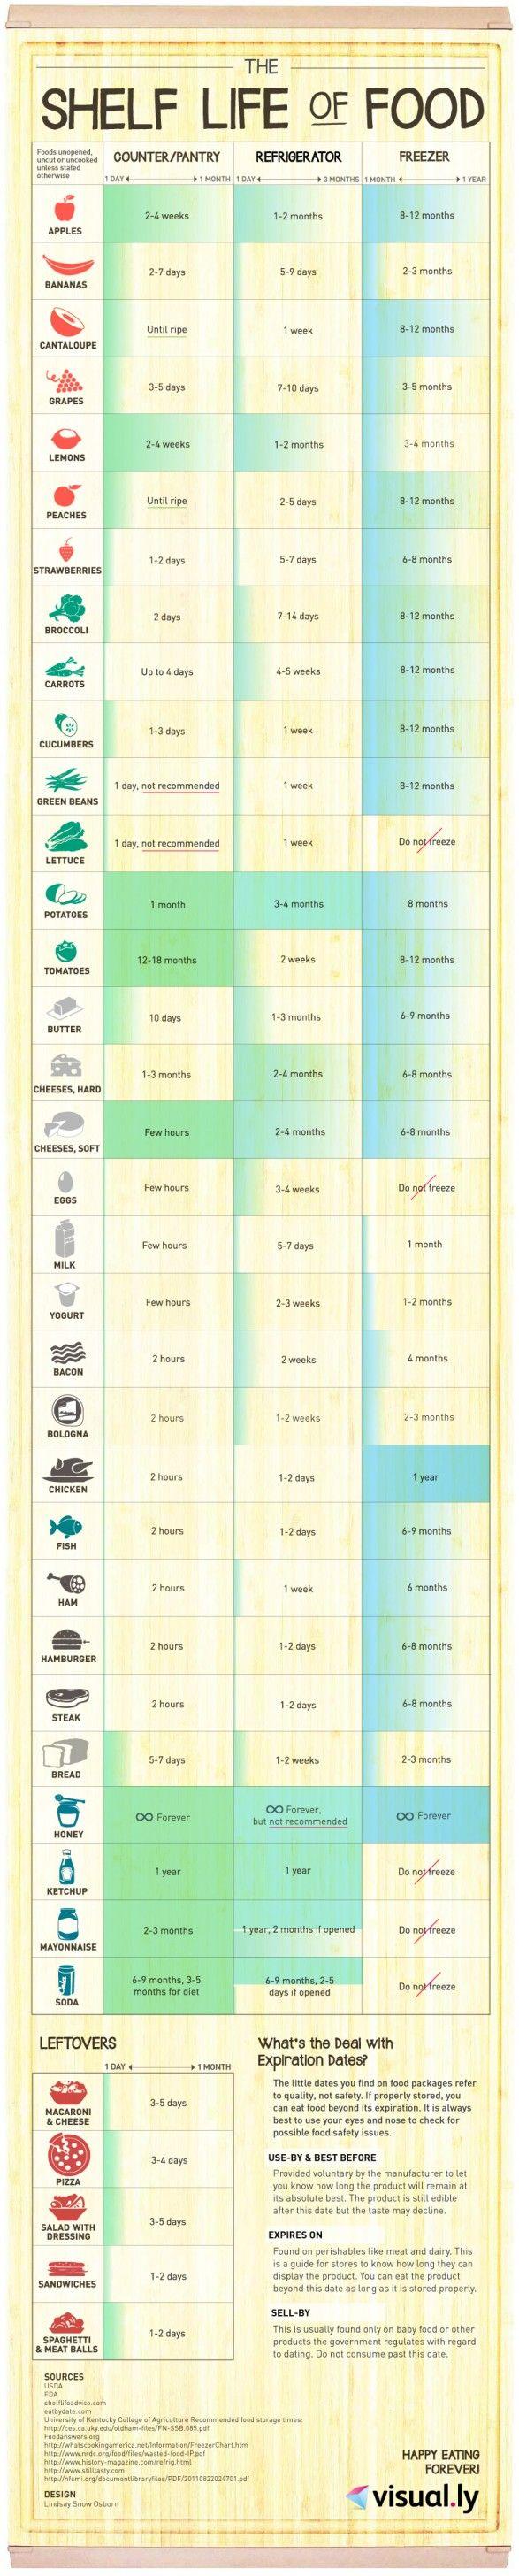 The Shelf Life of Food - Good info